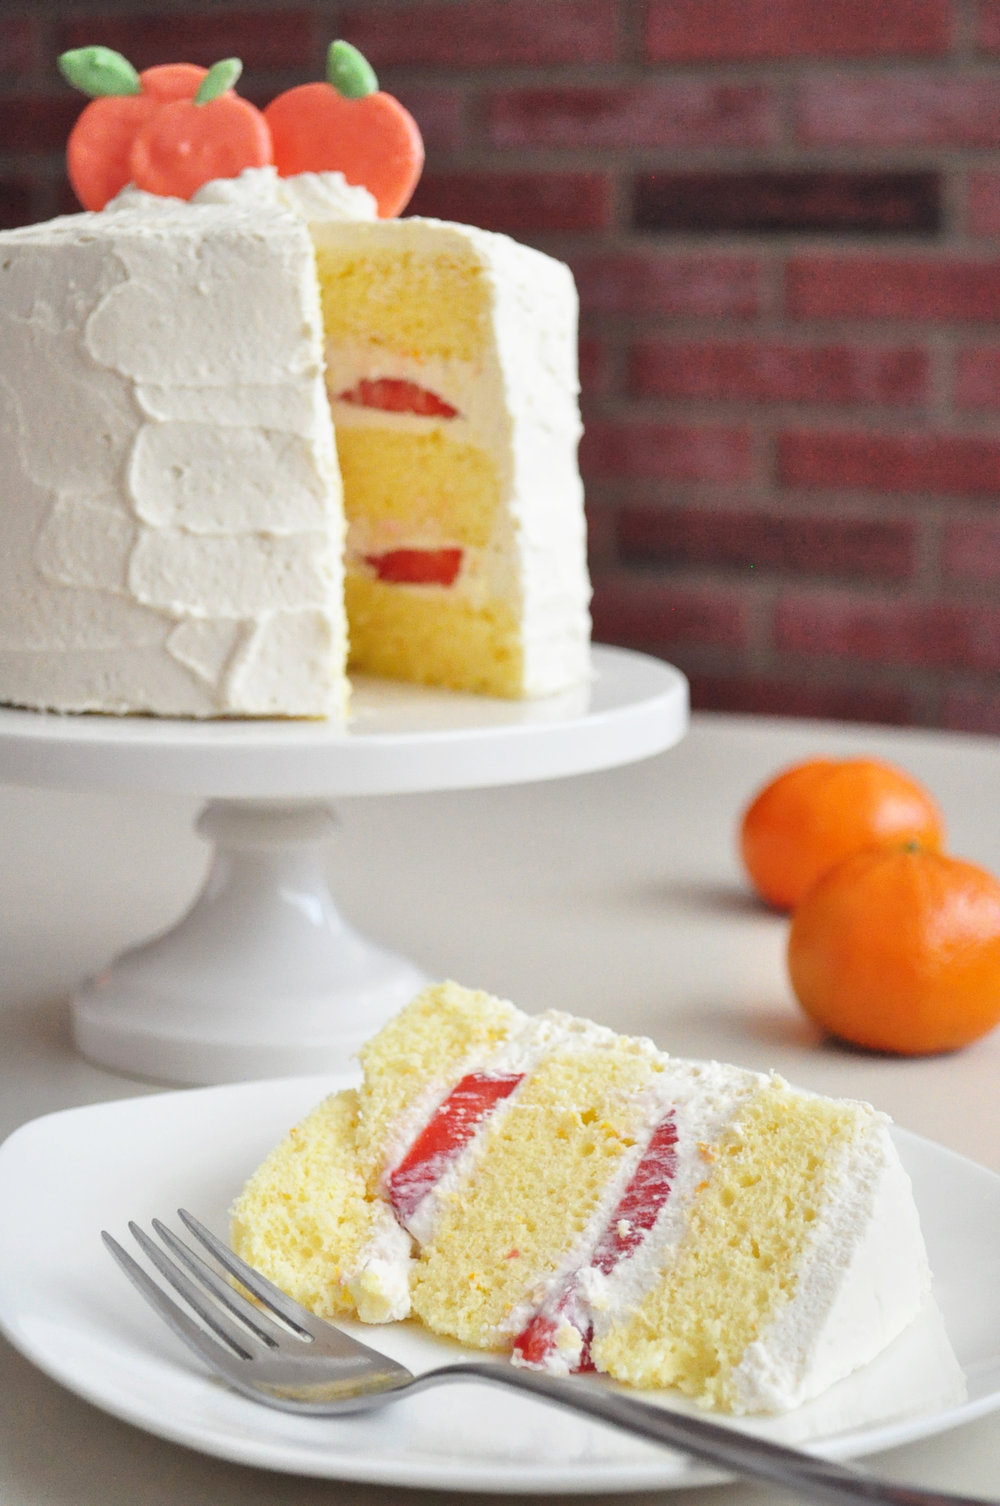 Orange Strawberry Cream Cake